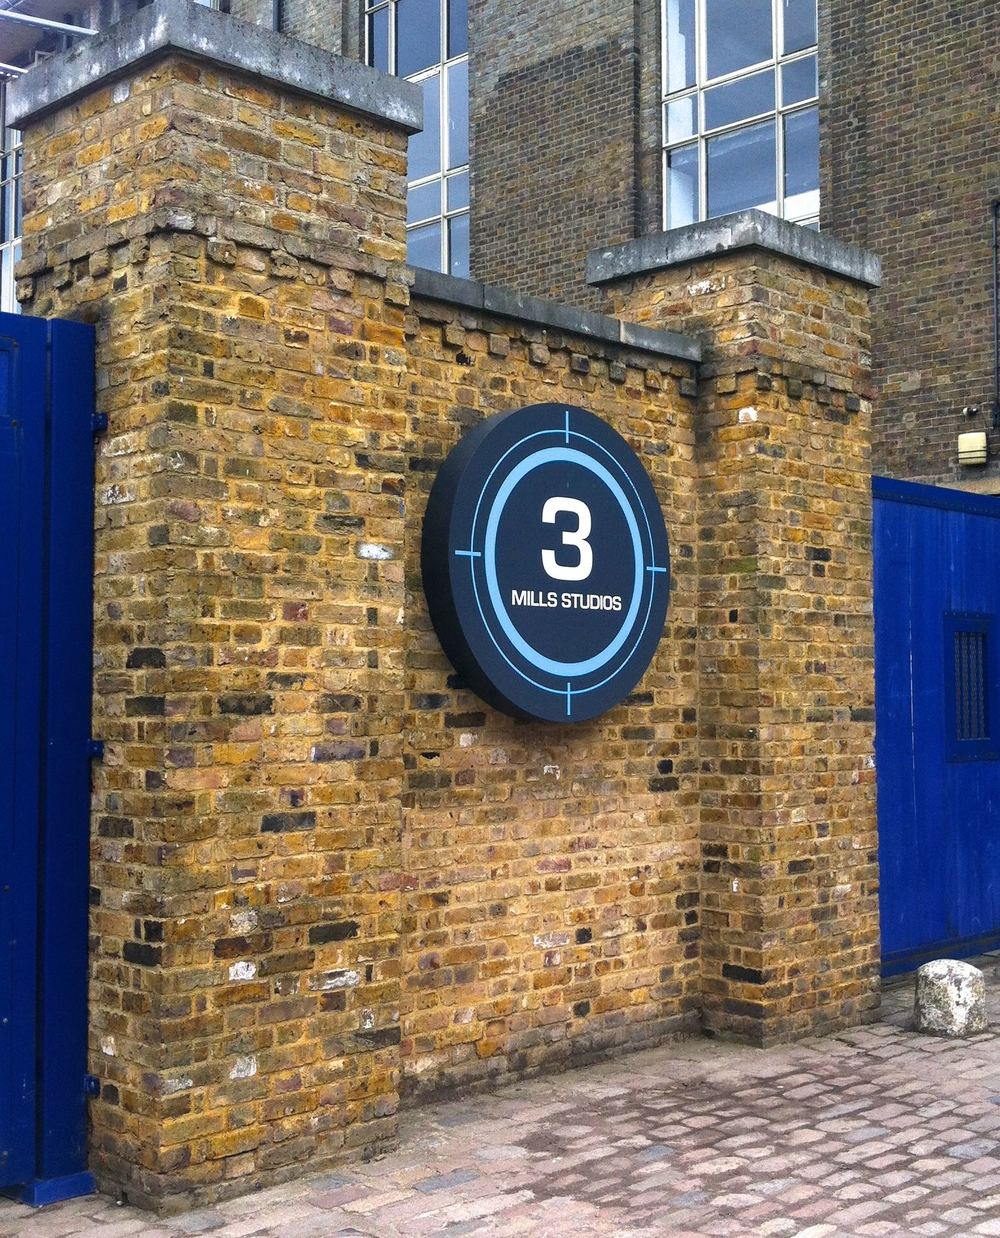 3 mills film studio london